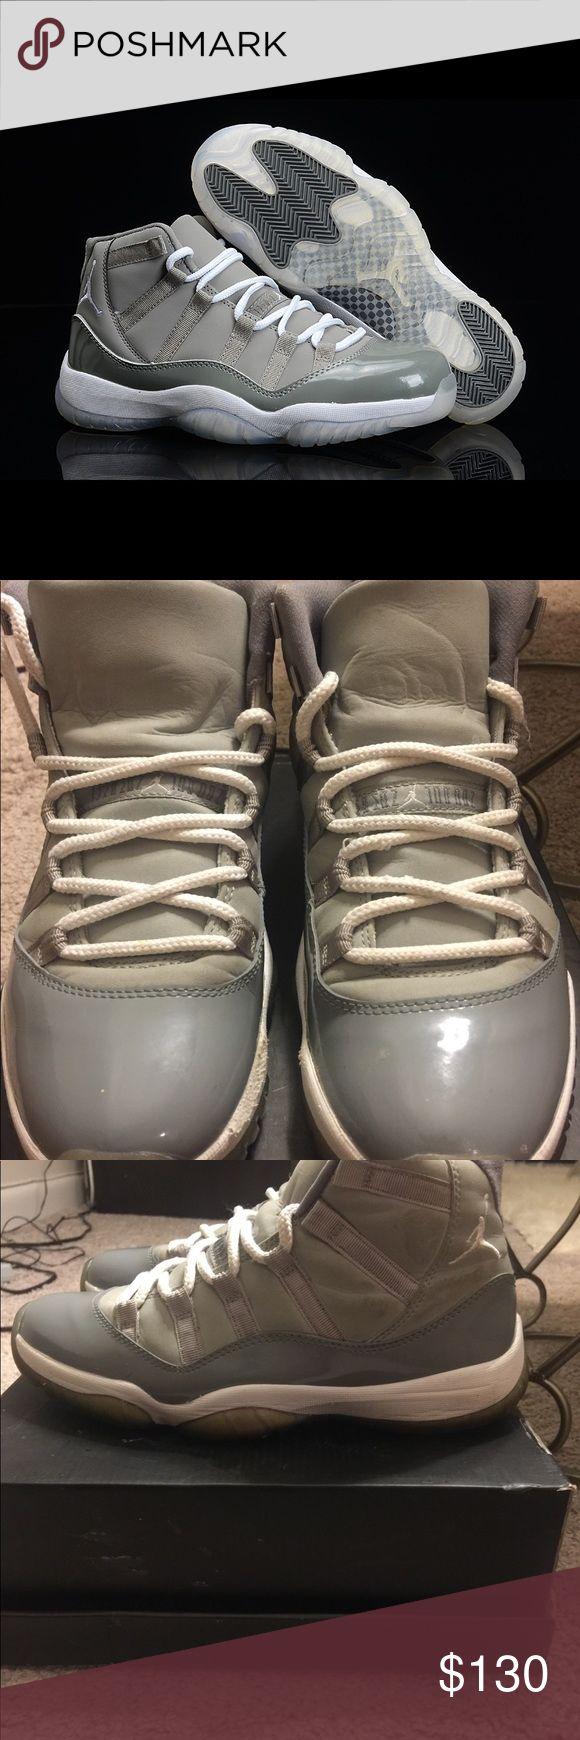 Authentic Jordan 11's cool grey/white. Authentic Jordan 11's cool grey/white sneakers. Gently worn. Good condition. Men's size 8 or Women's size 10. Jordan Shoes Sneakers